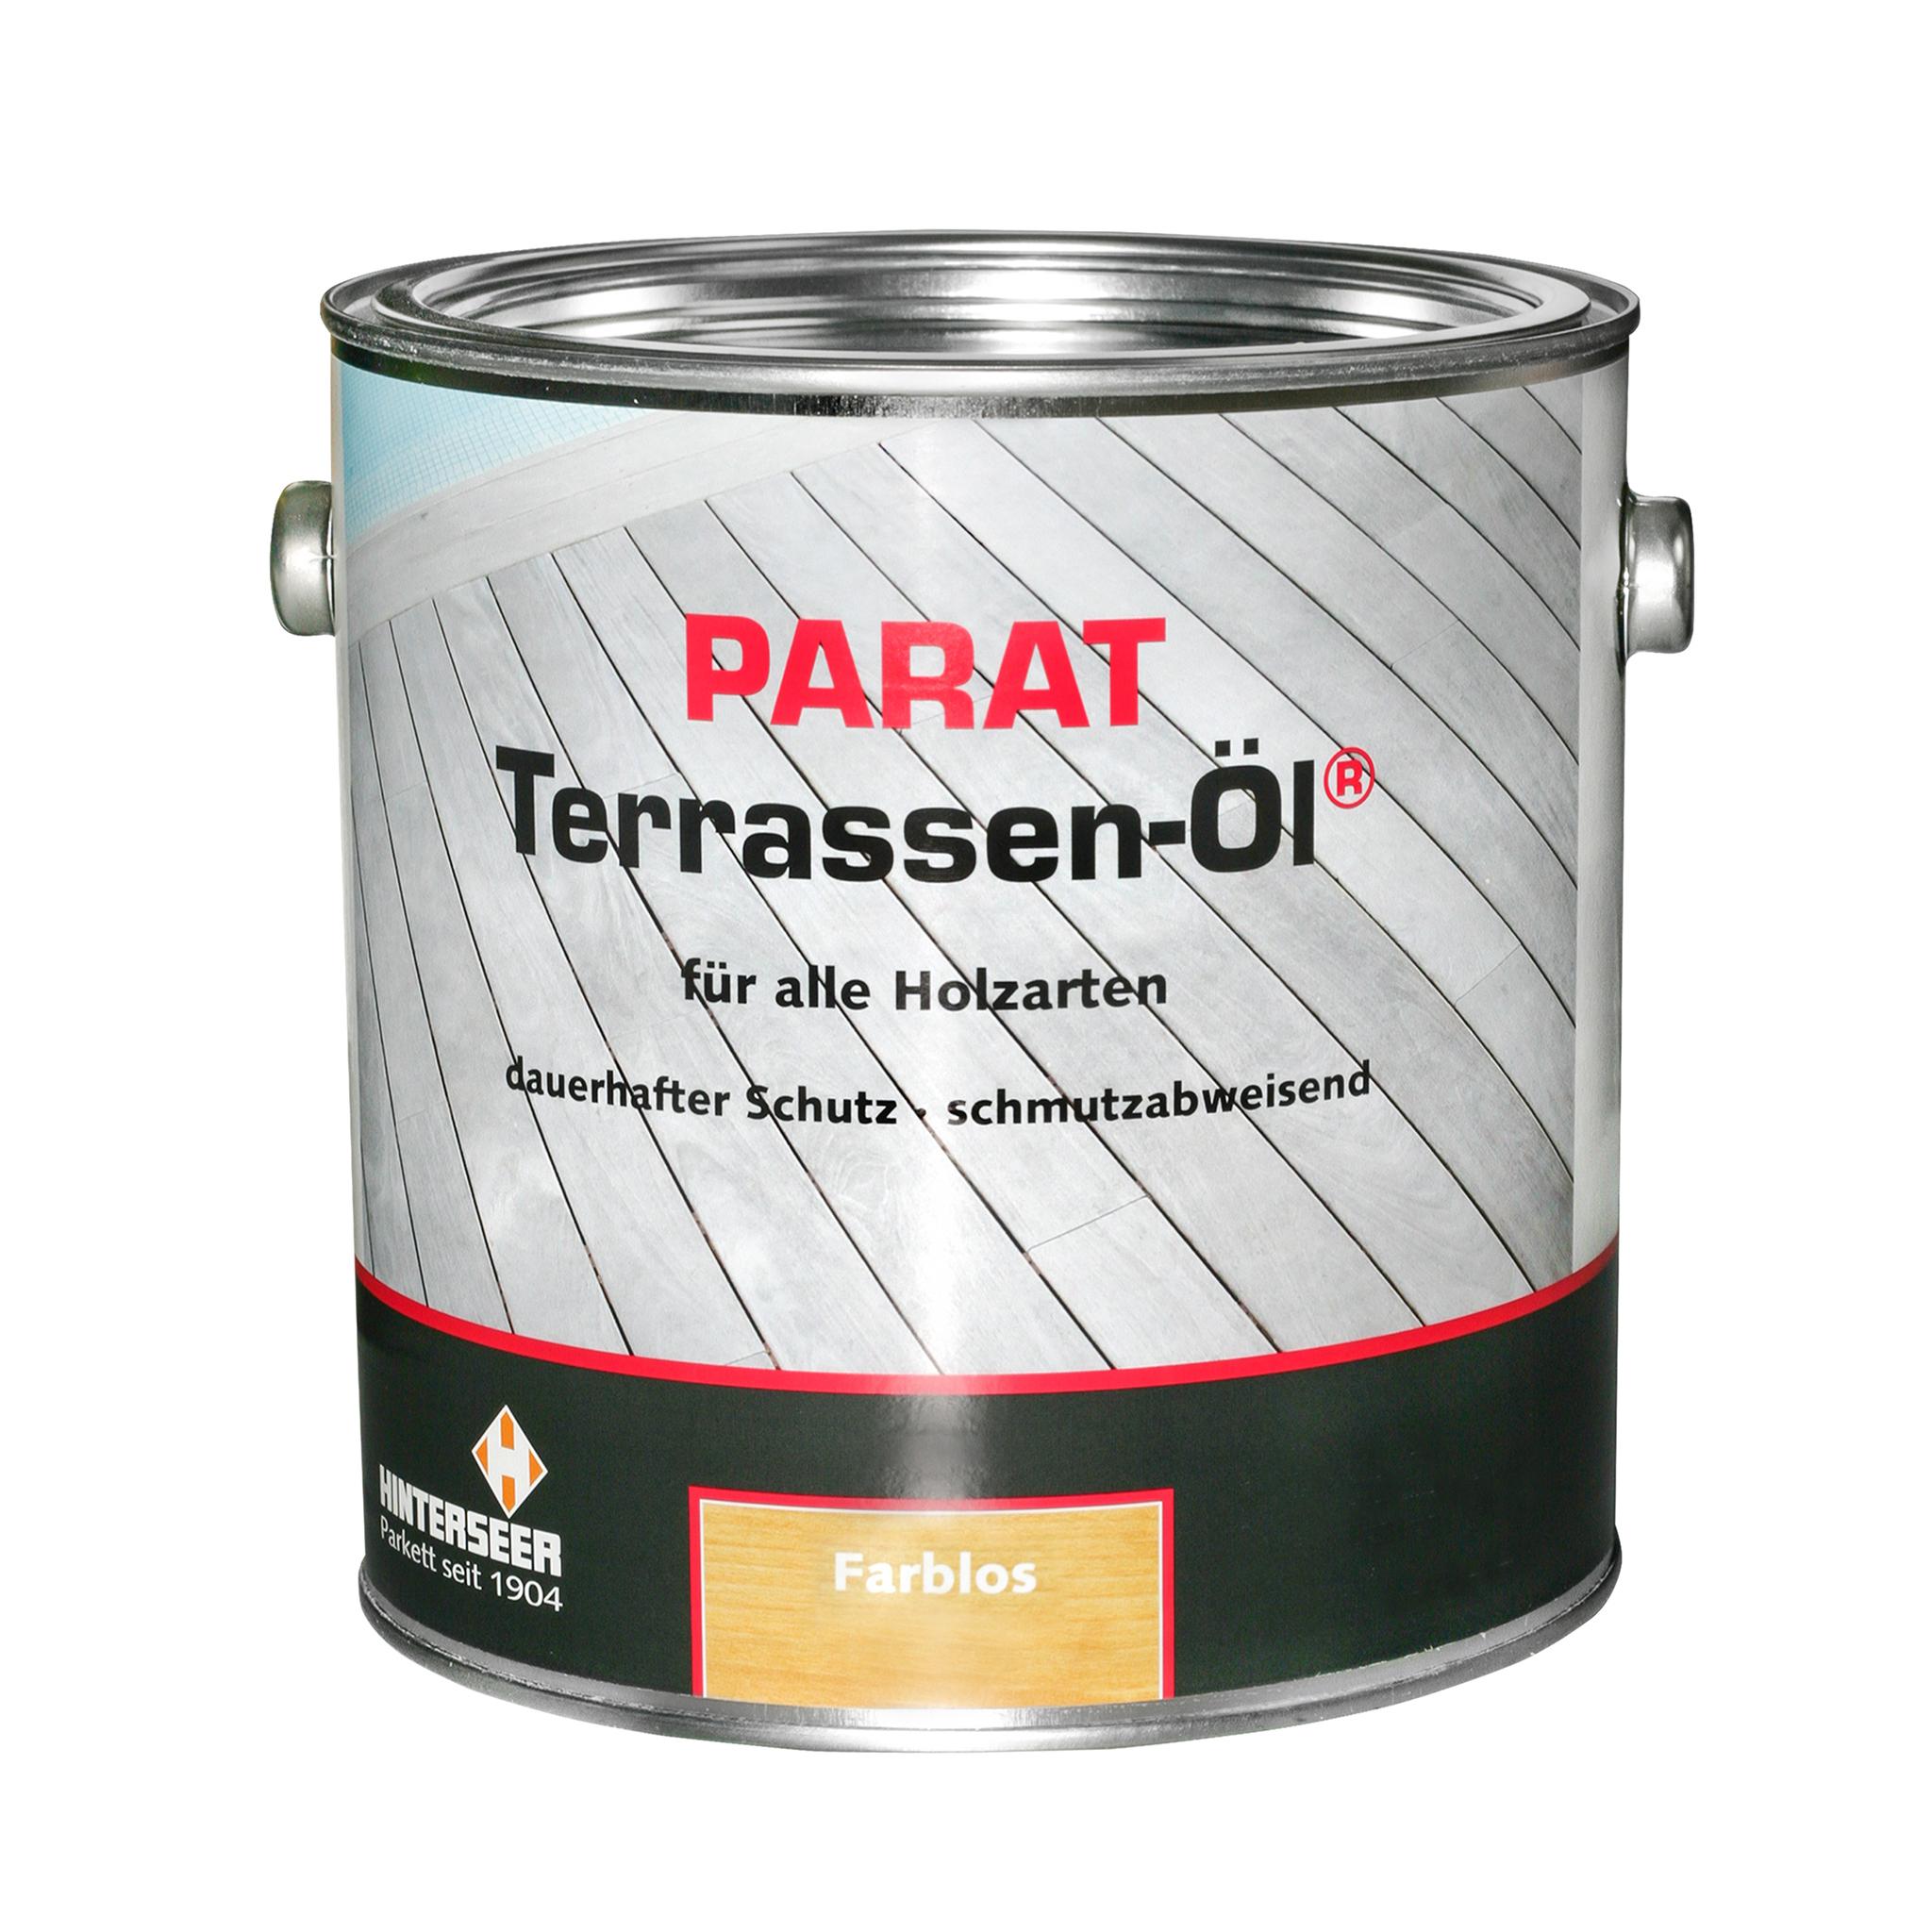 PARAT Terrassenöl 2,5 Ltr. Farbvarianten